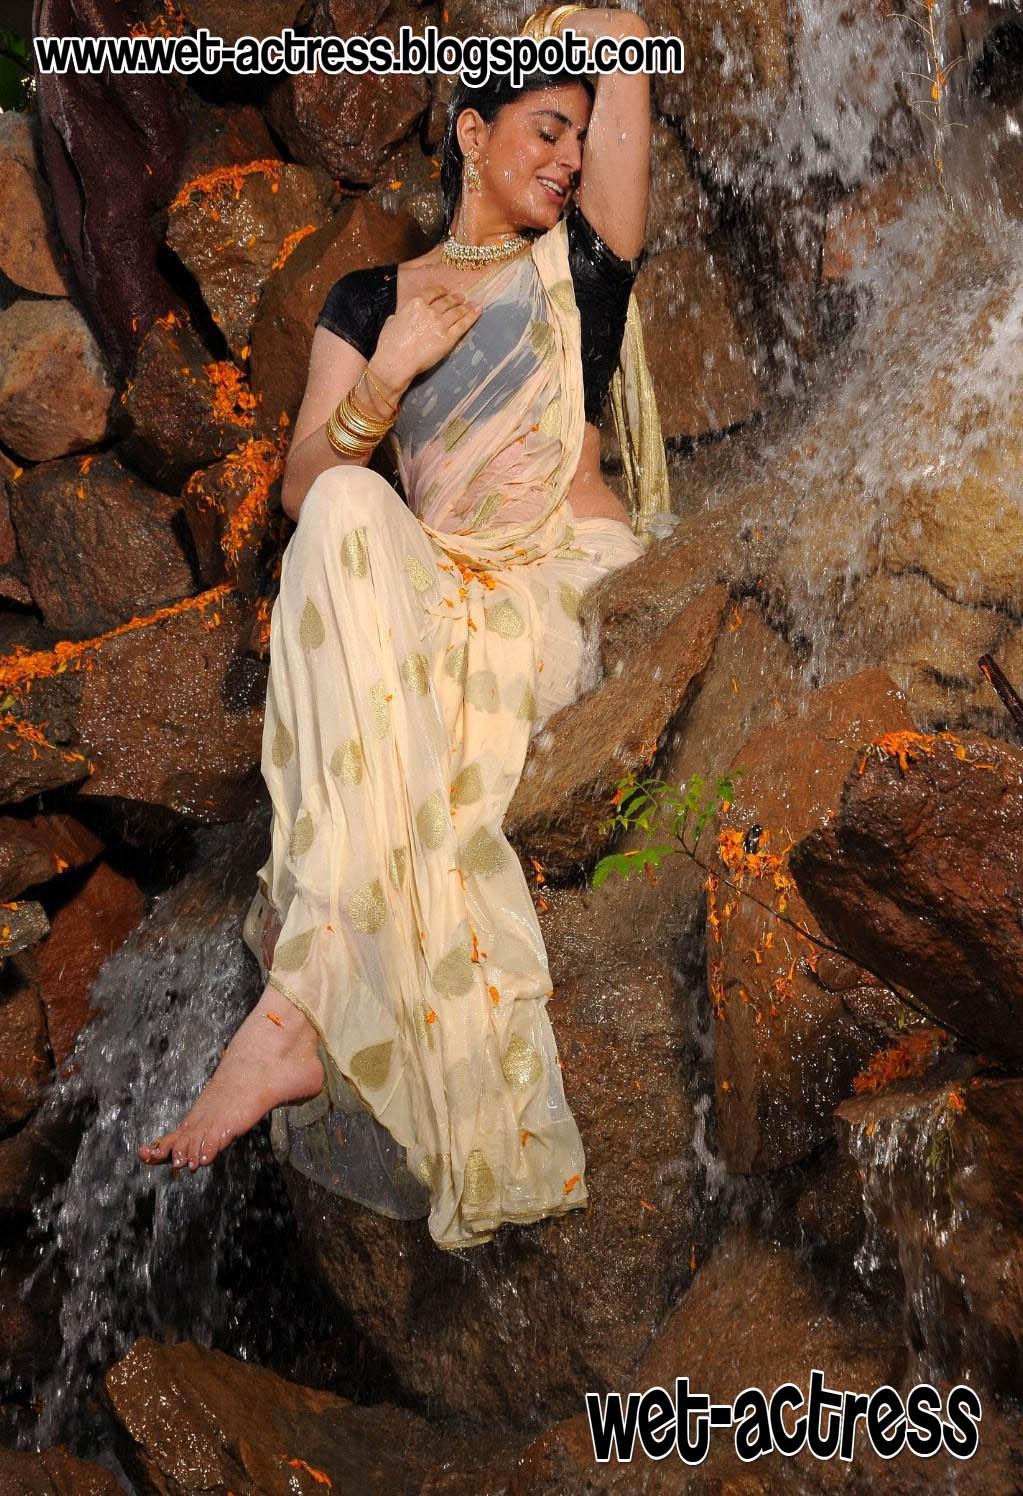 wet photos wallpapers of popular indian actresses models wet photos